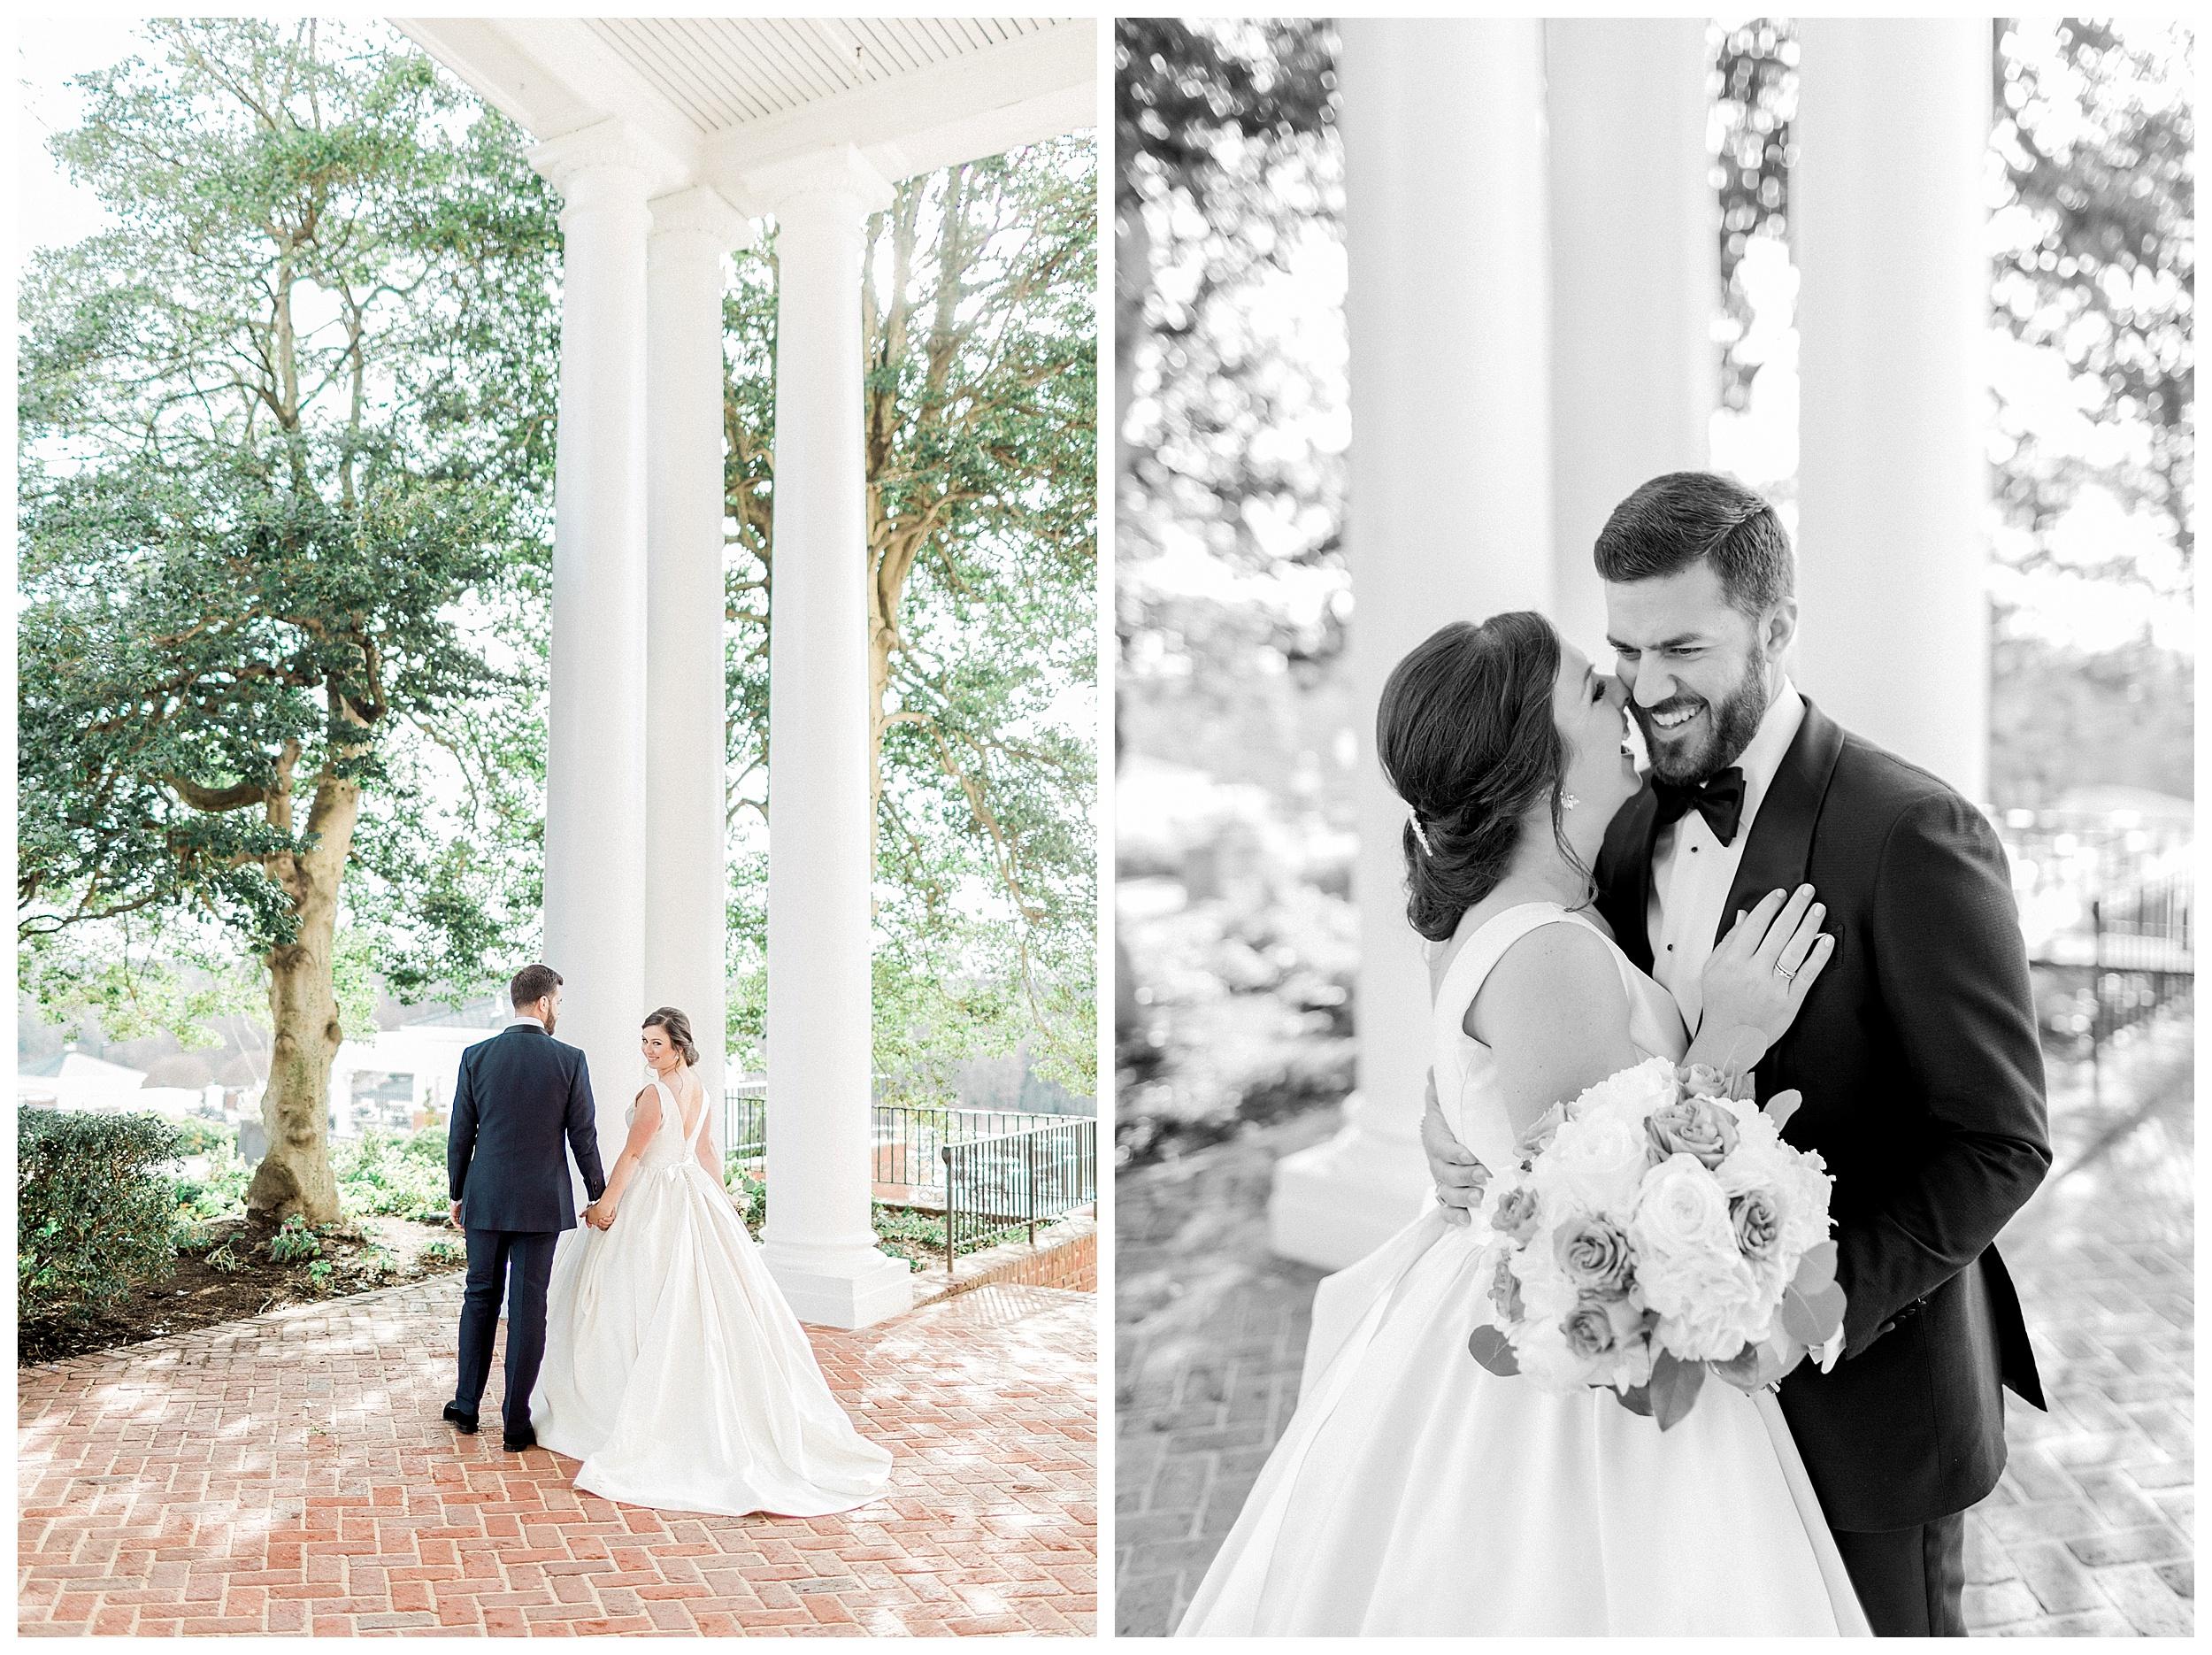 Country Club of Virginia Wedding | Richmond Wedding Photographer_0110.jpg